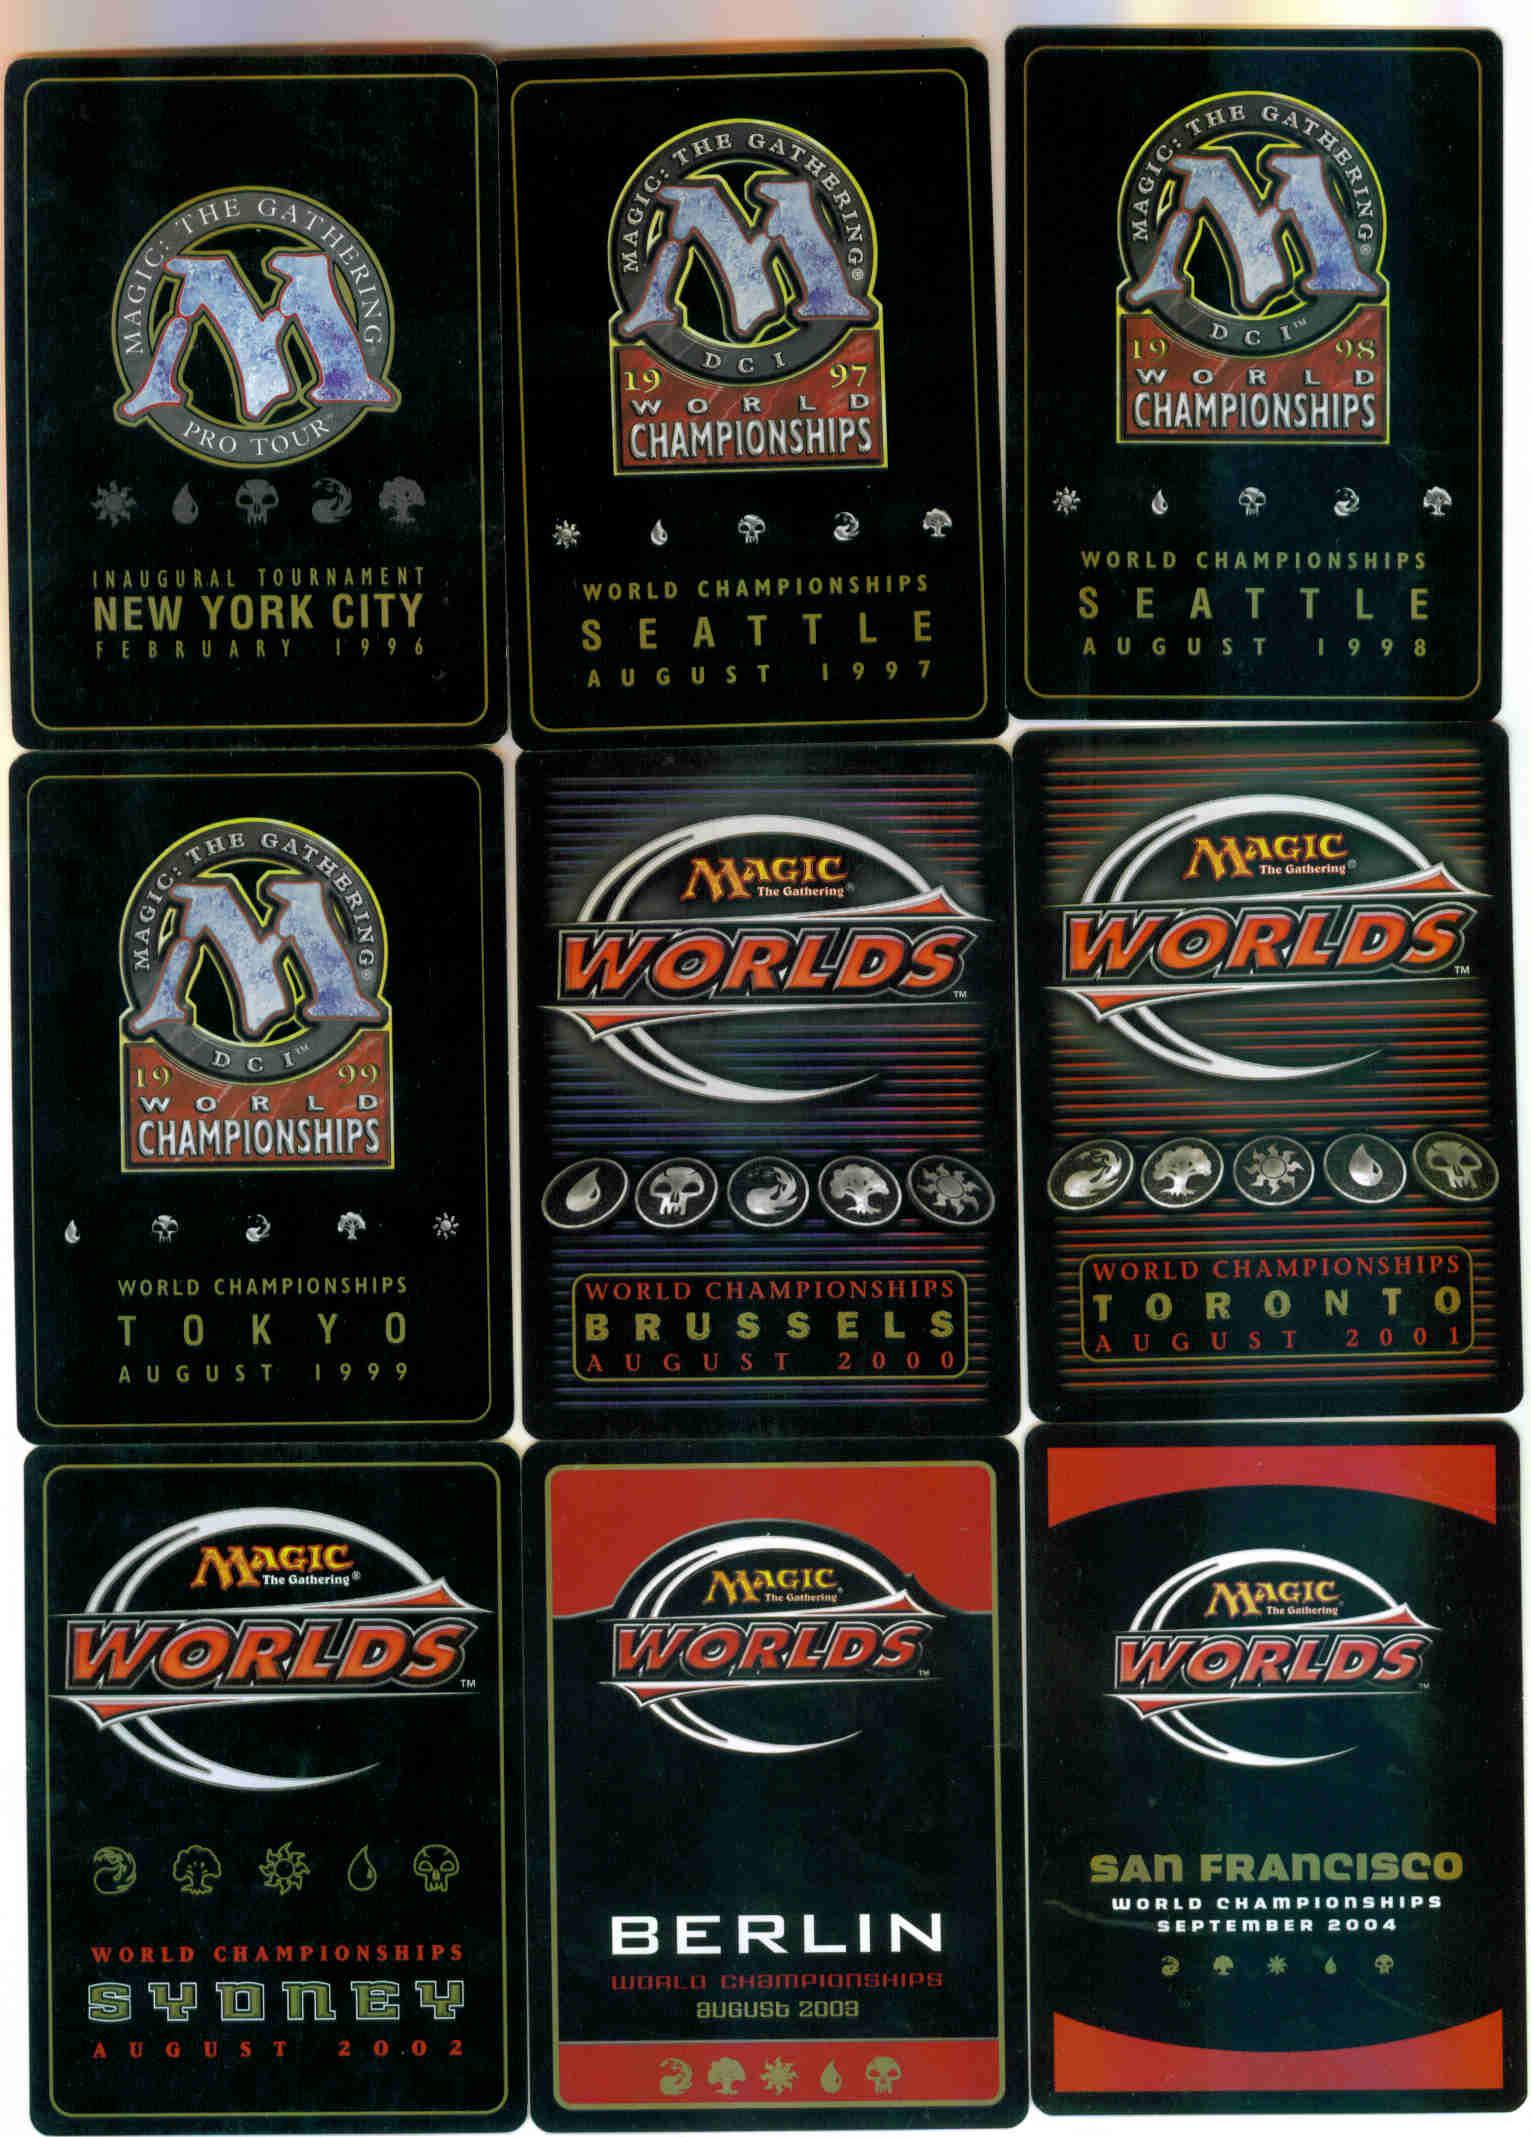 1996 World Championship Blank Card